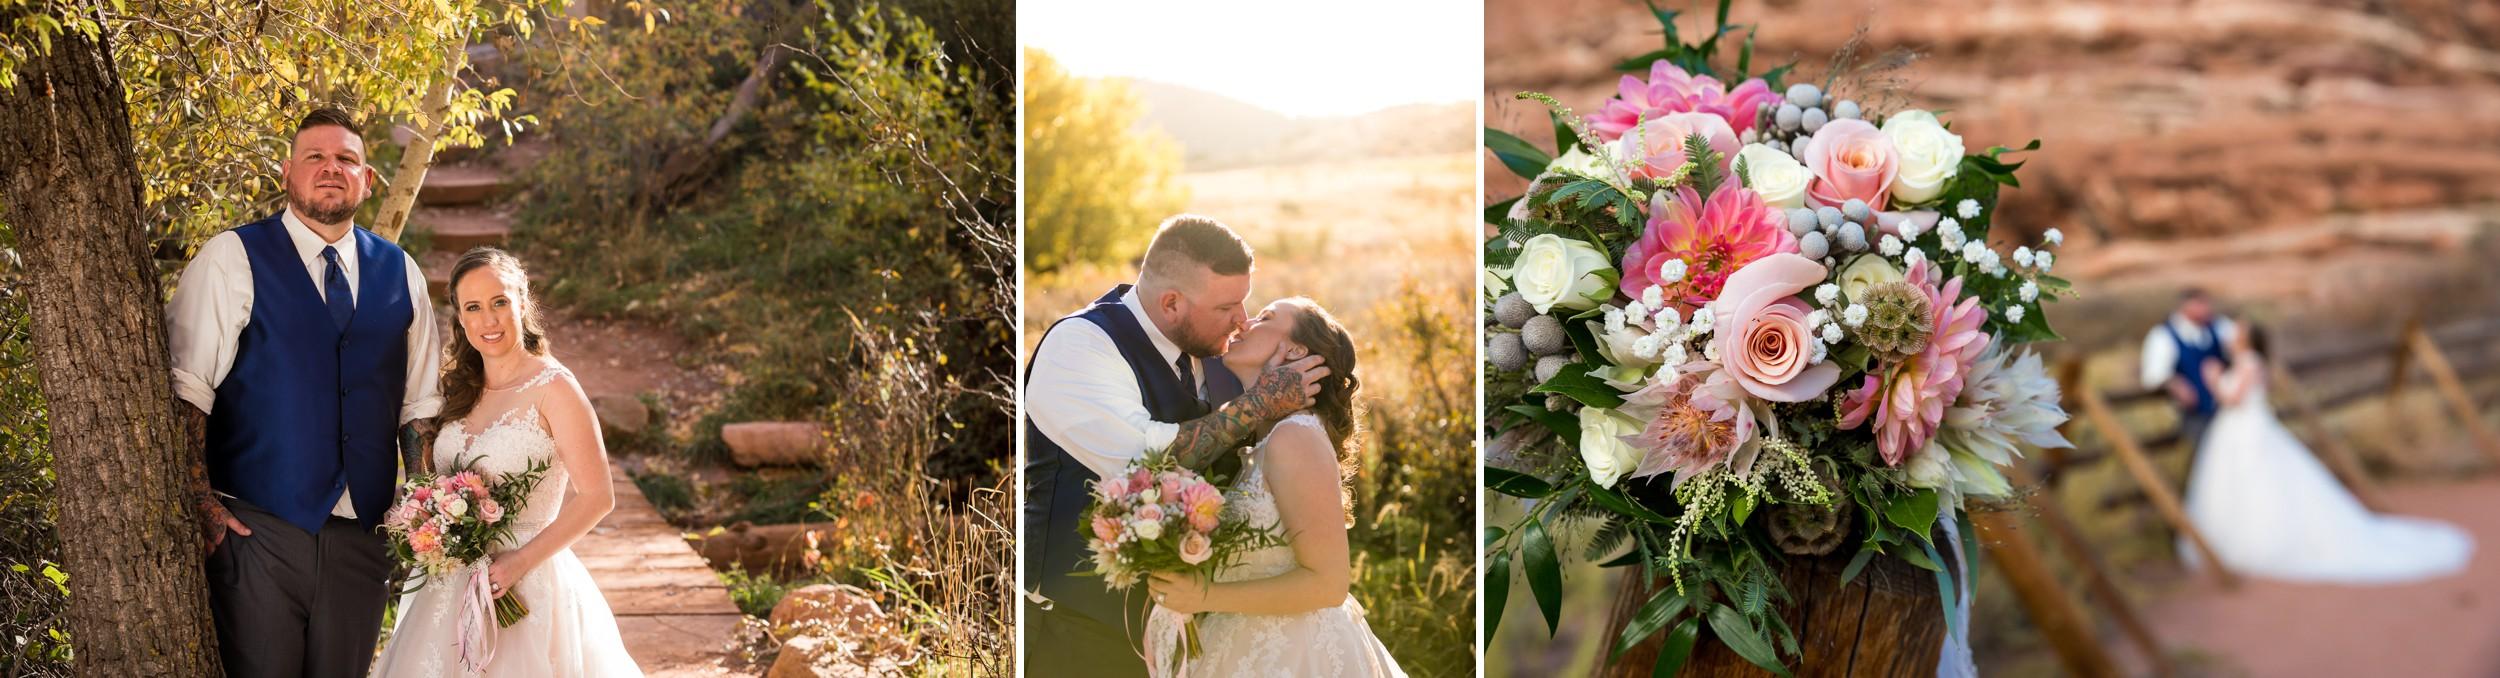 Red_Rocks_Country_Club_Wedding_Kristopher_Lindsay_Photography_ 9.jpg